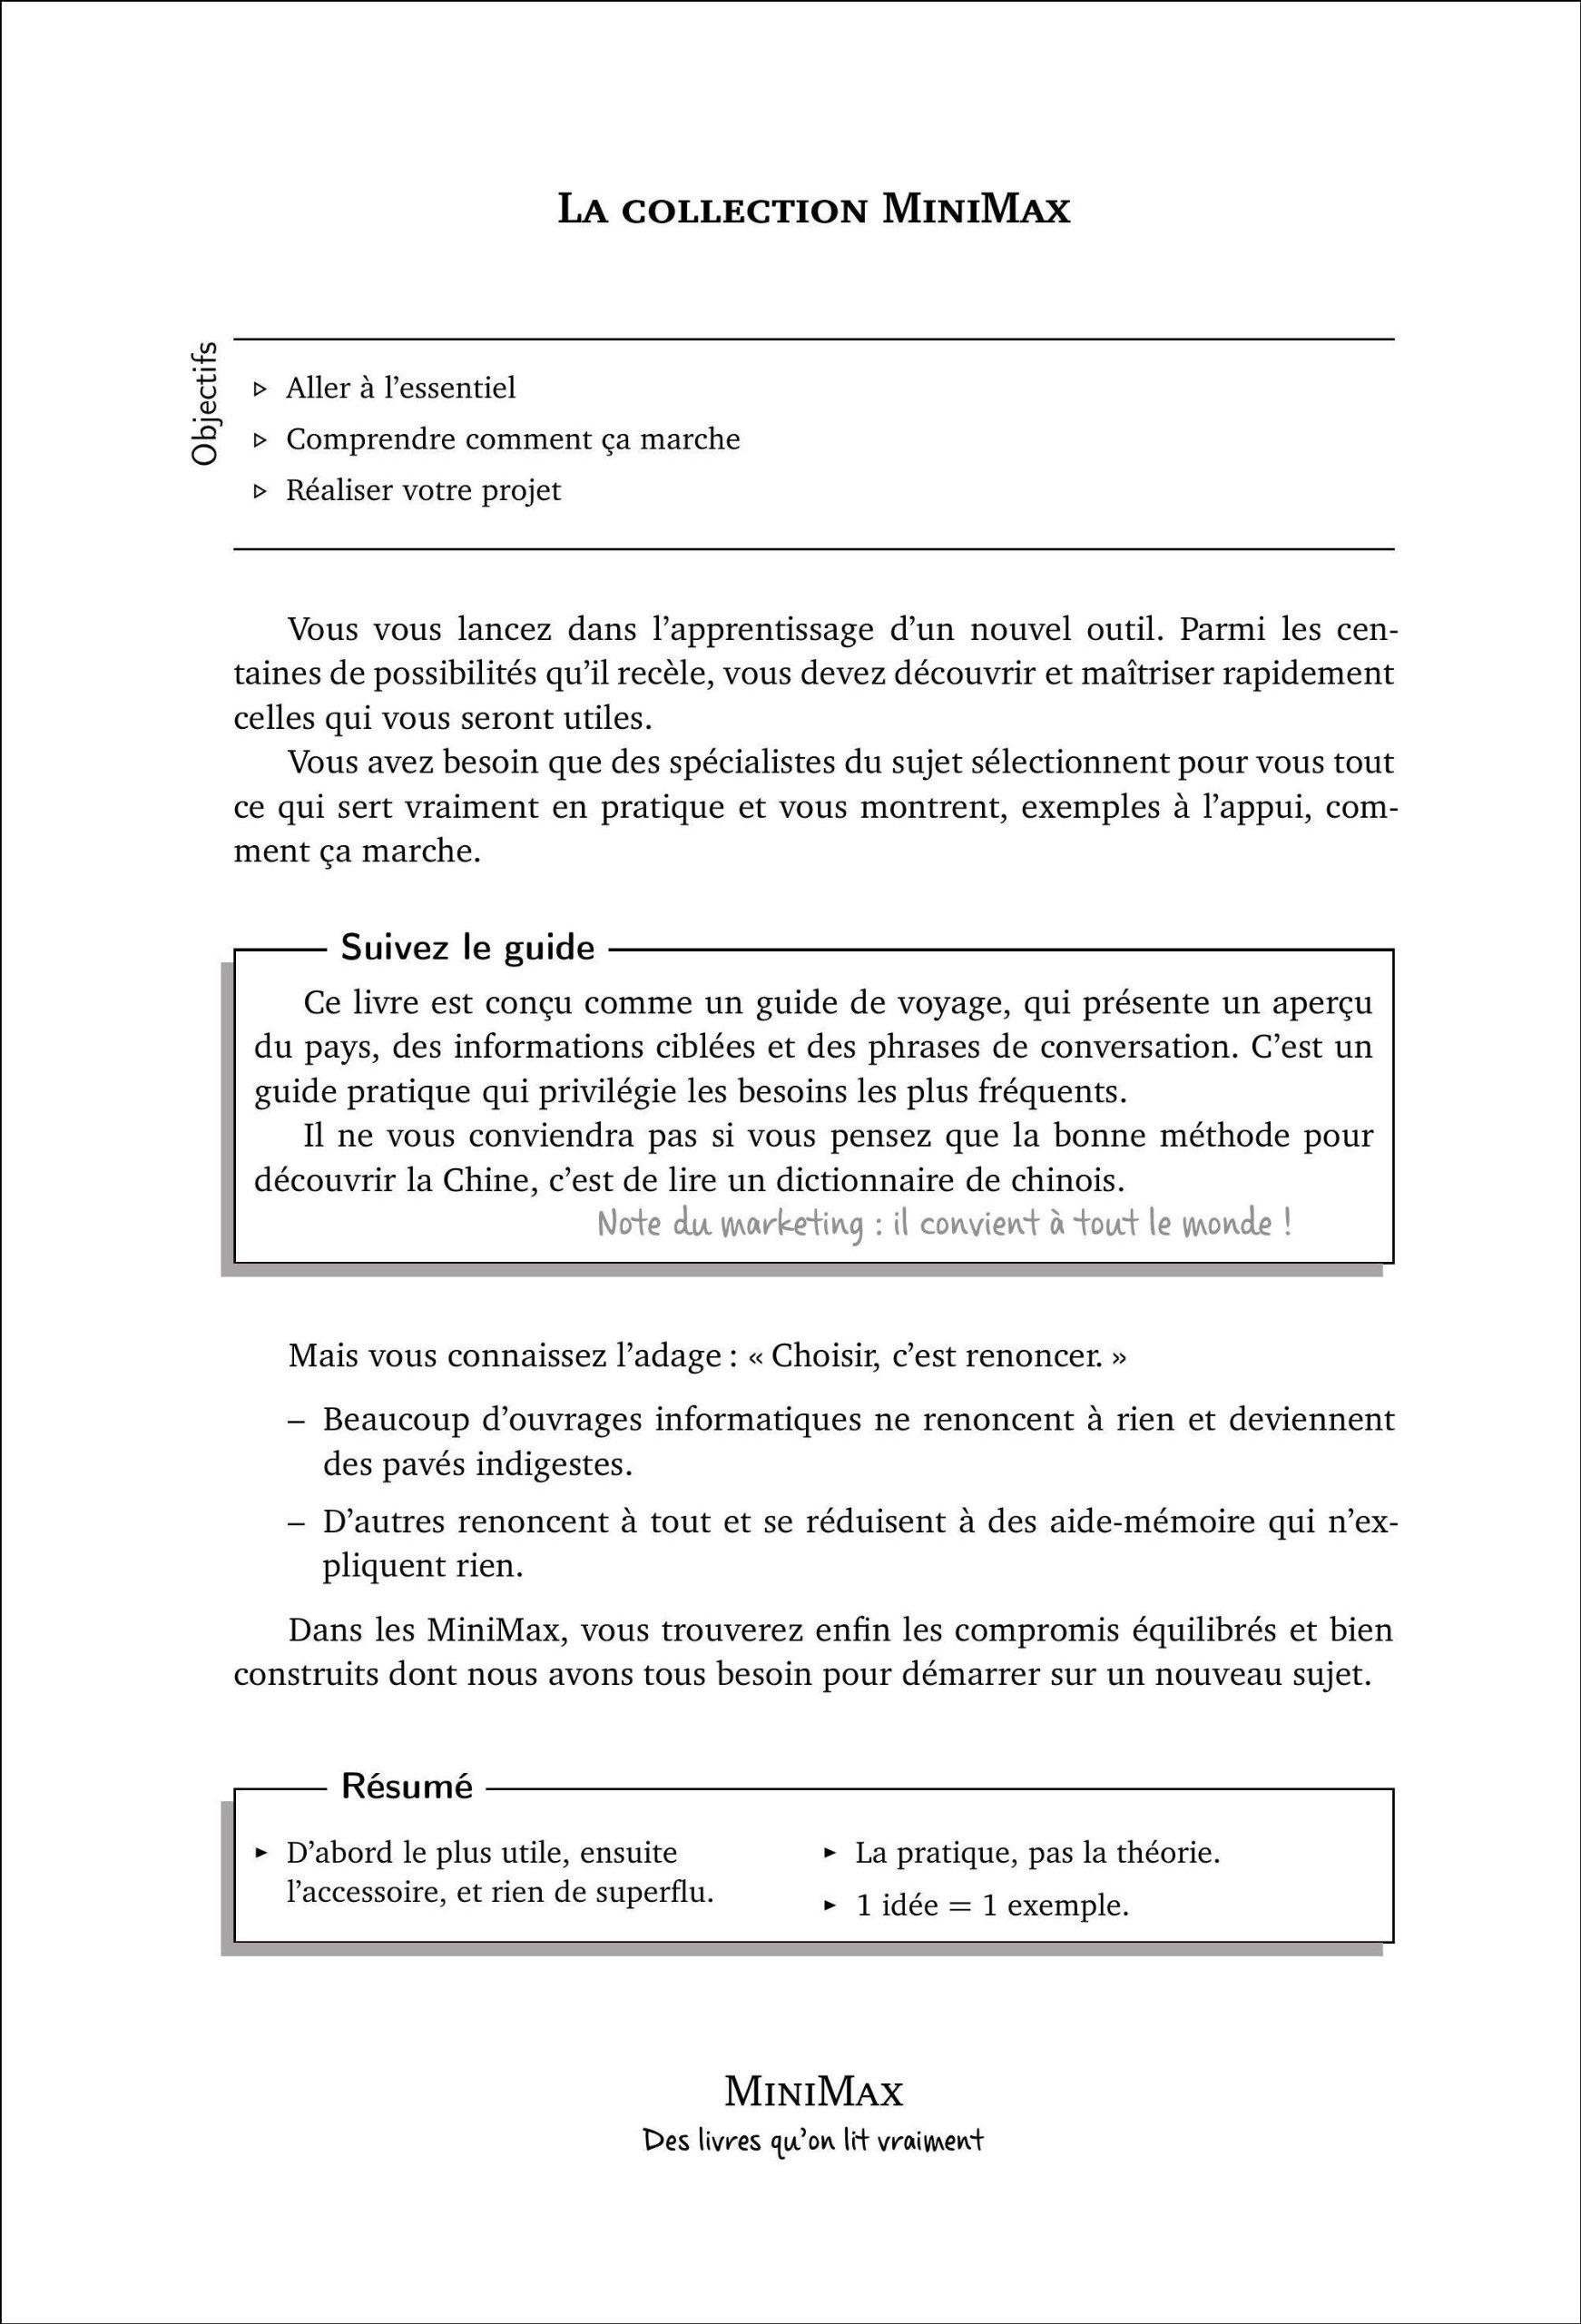 La ligne de commande par lexemple (MiniMax): Amazon.es: Vincent Fourmond: Libros en idiomas extranjeros